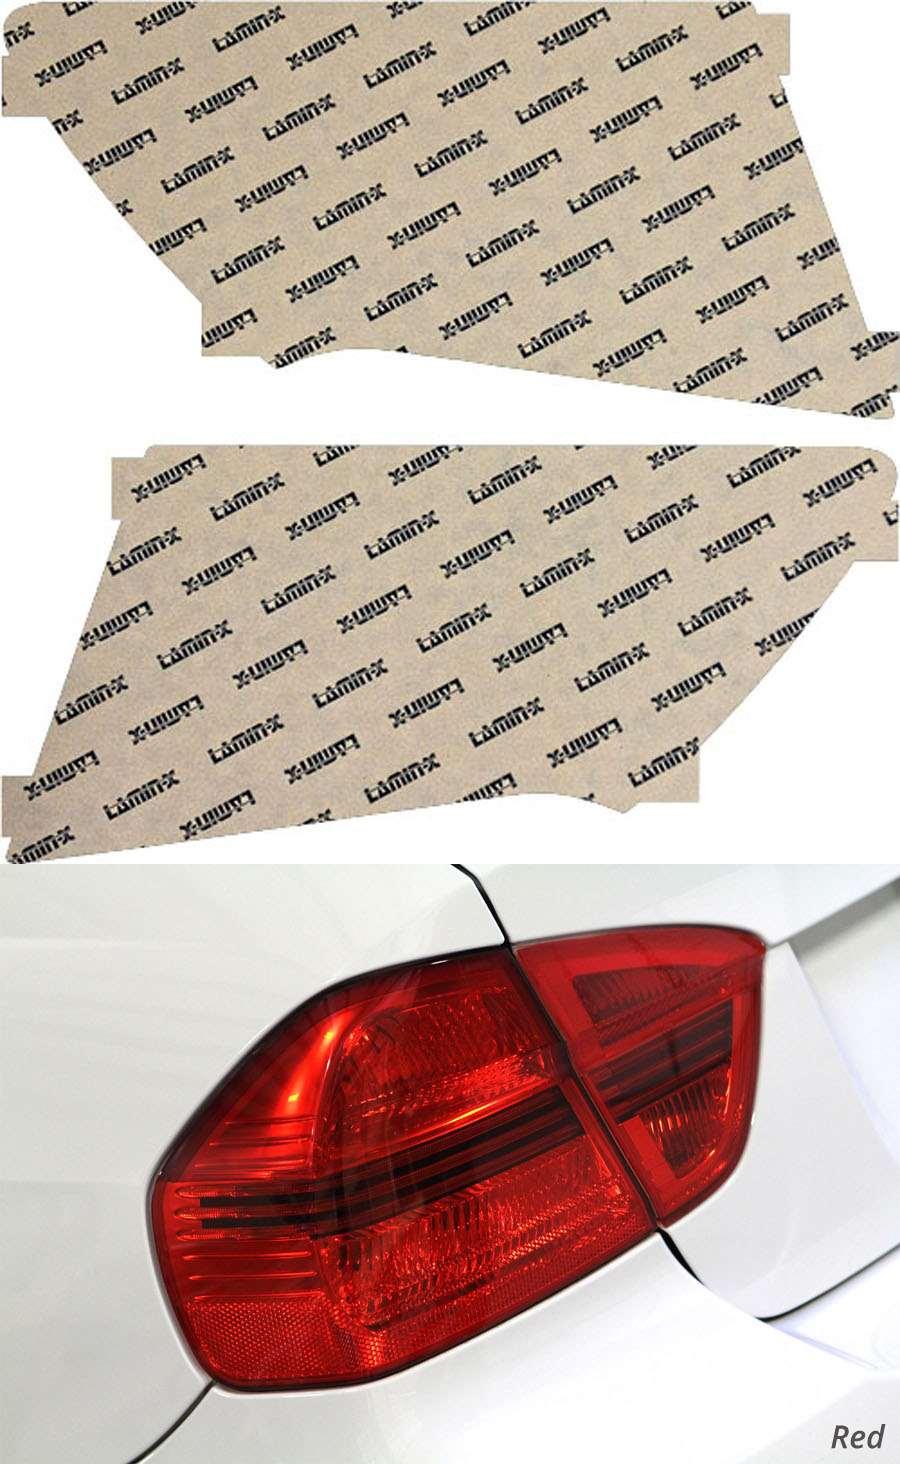 Subaru WRX Sedan 08-14 Red Tail Light Covers Lamin-X S216R